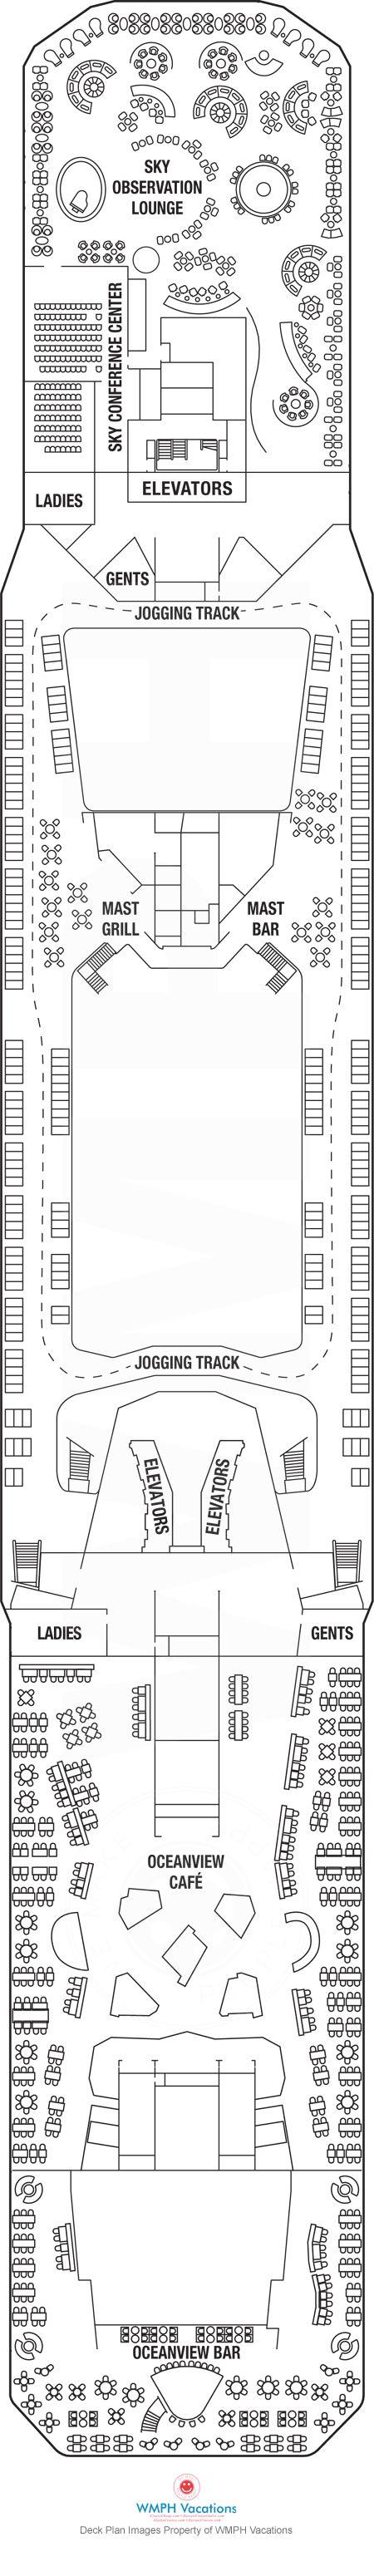 Best Deck Plans Images On Pinterest Deck Plans Decks And - Celebrity cruise ship silhouette deck plans